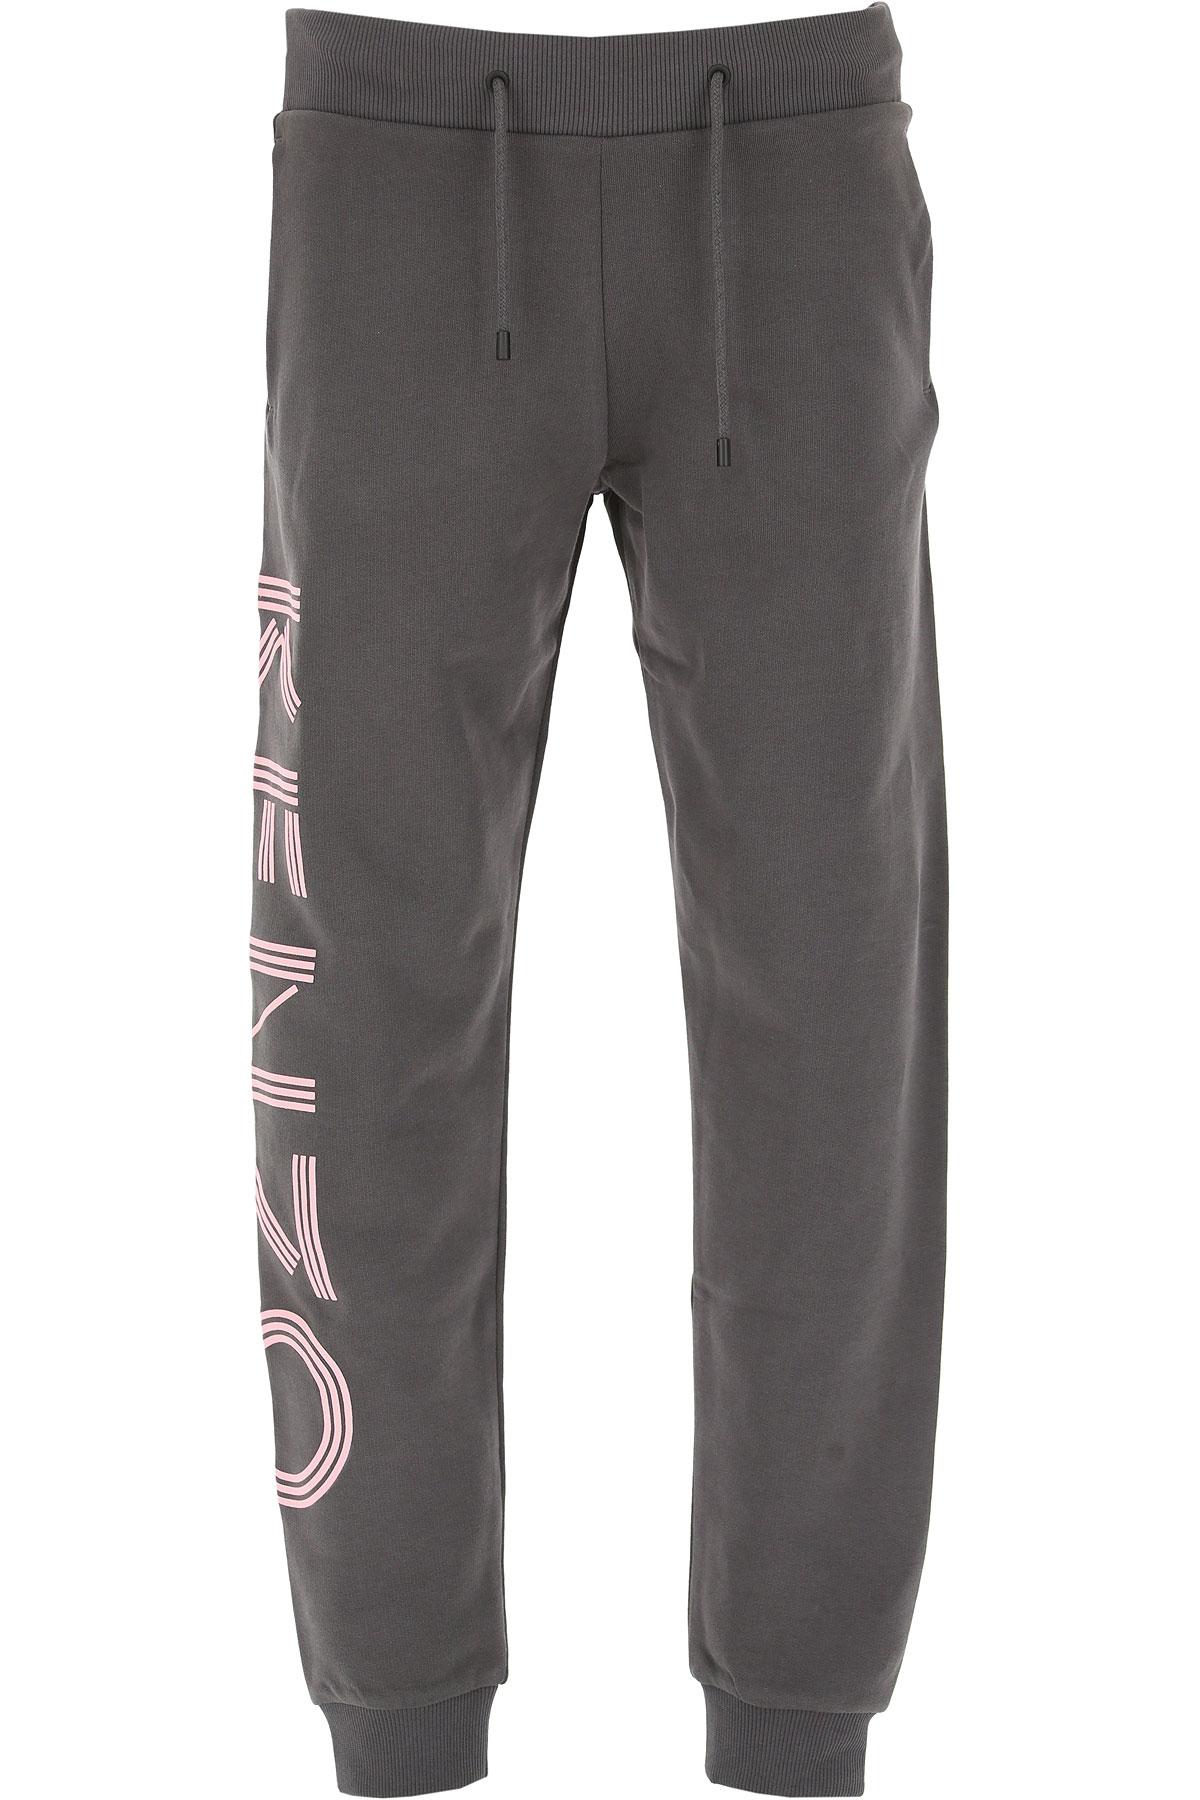 Image of Kenzo Sweatpants, Dark Anthracite Grey, Cotton, 2017, 10 2 4 6 8